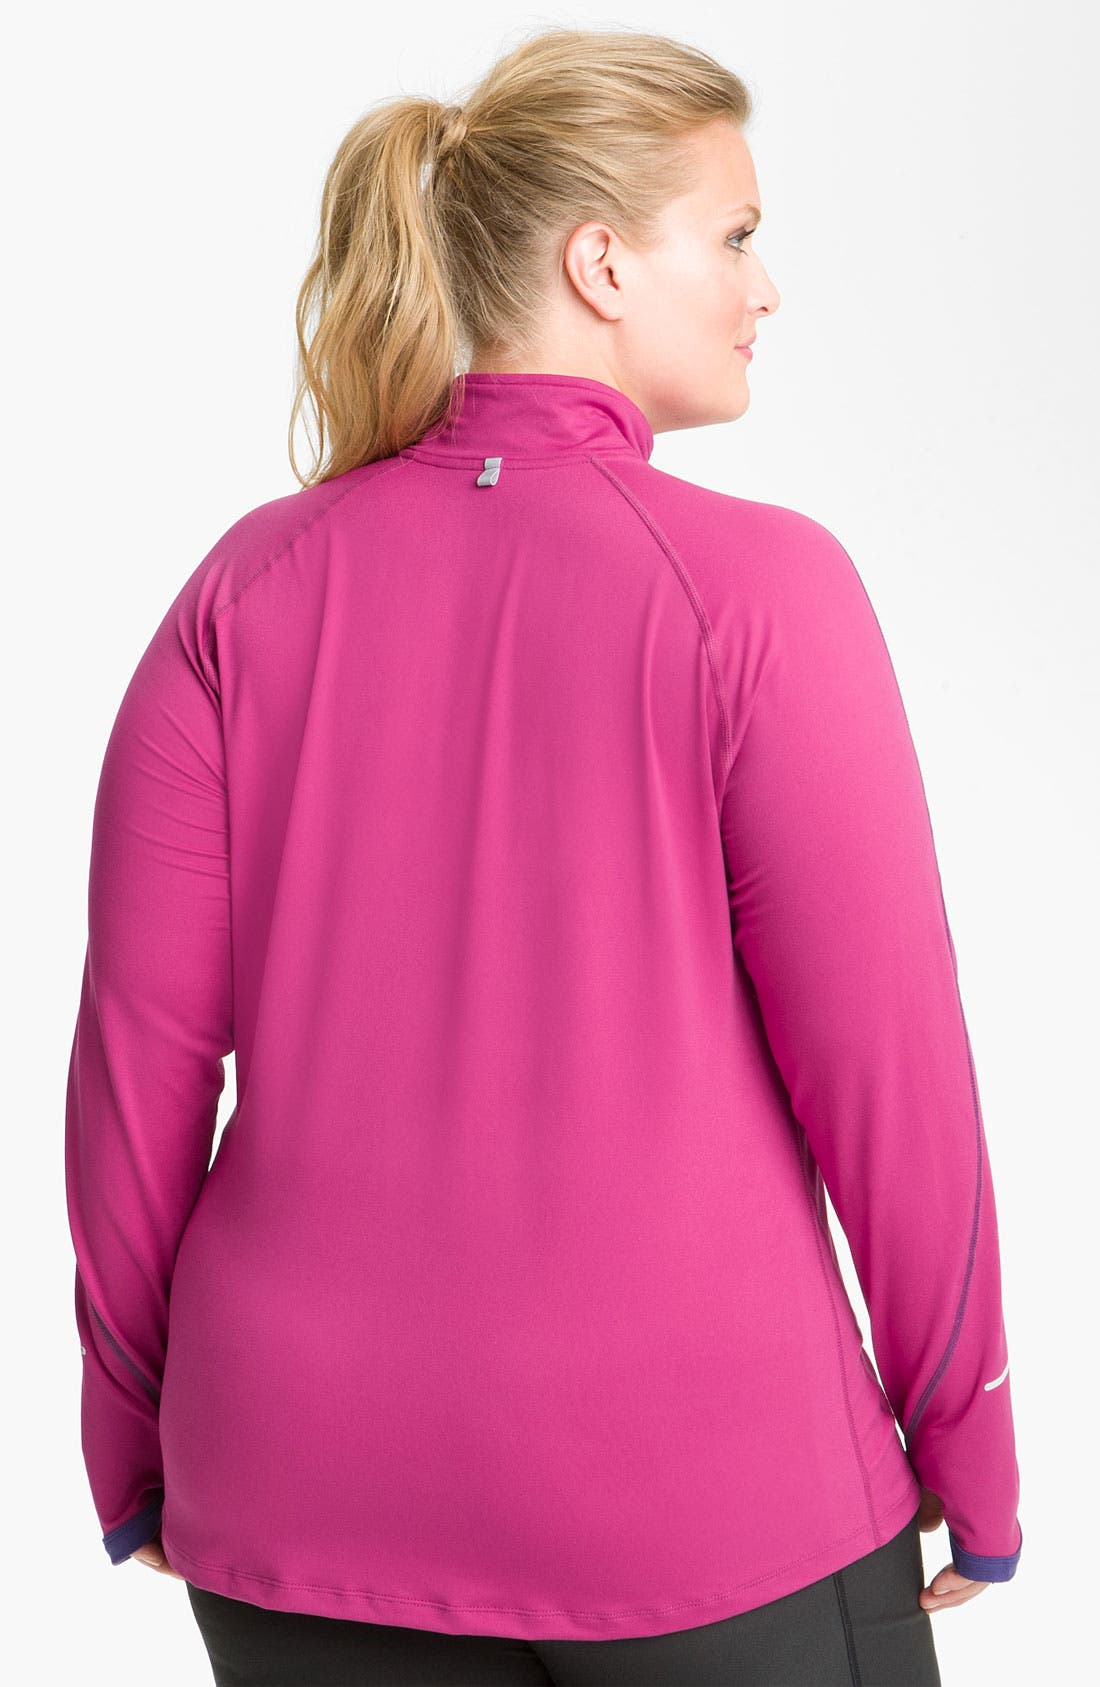 Alternate Image 2  - Nike 'Element' Half Zip Running Top (Plus Size)